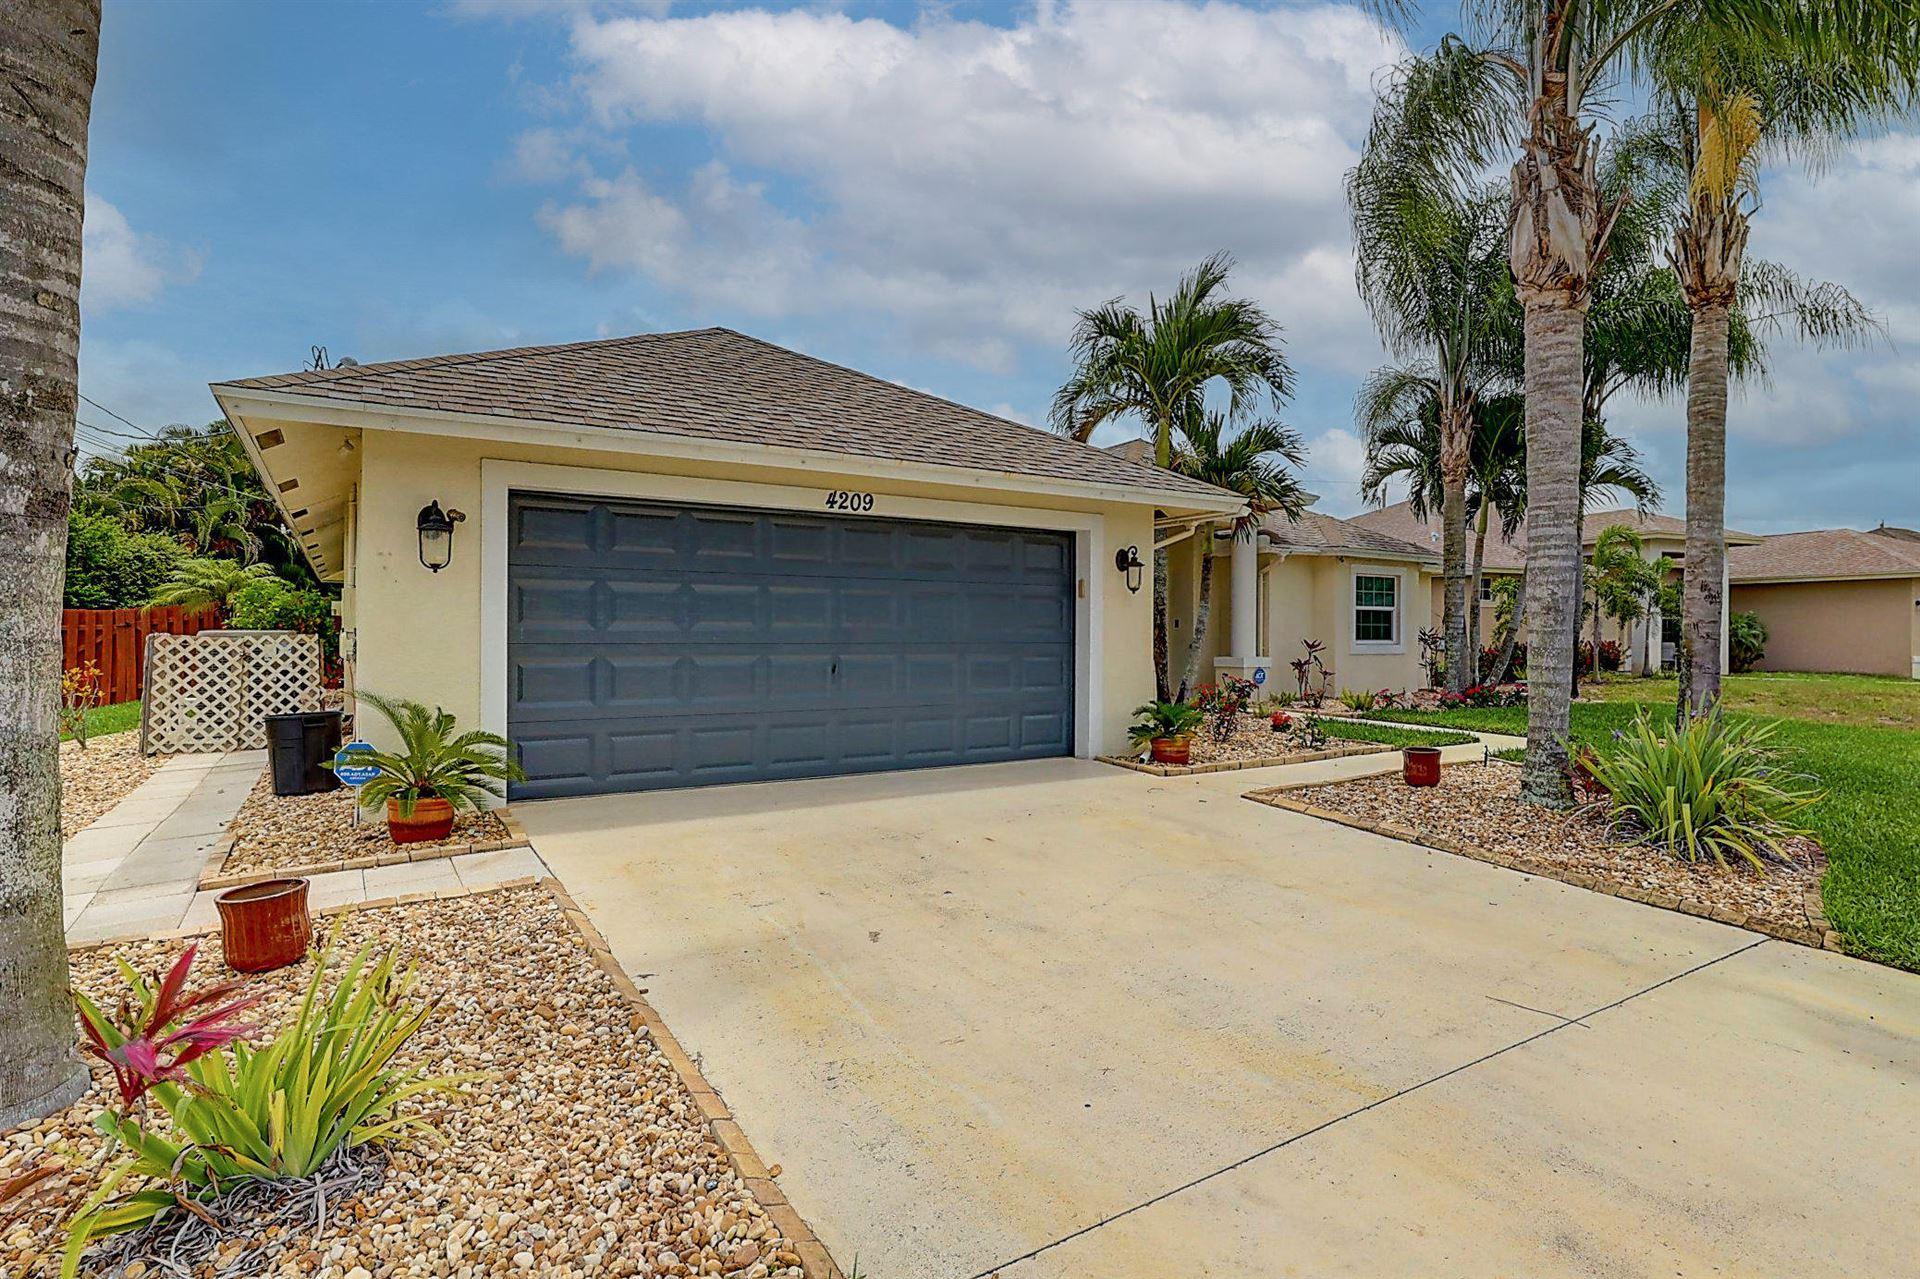 4209 SW Xenon Street, Port Saint Lucie, FL 34953 - MLS#: RX-10716629